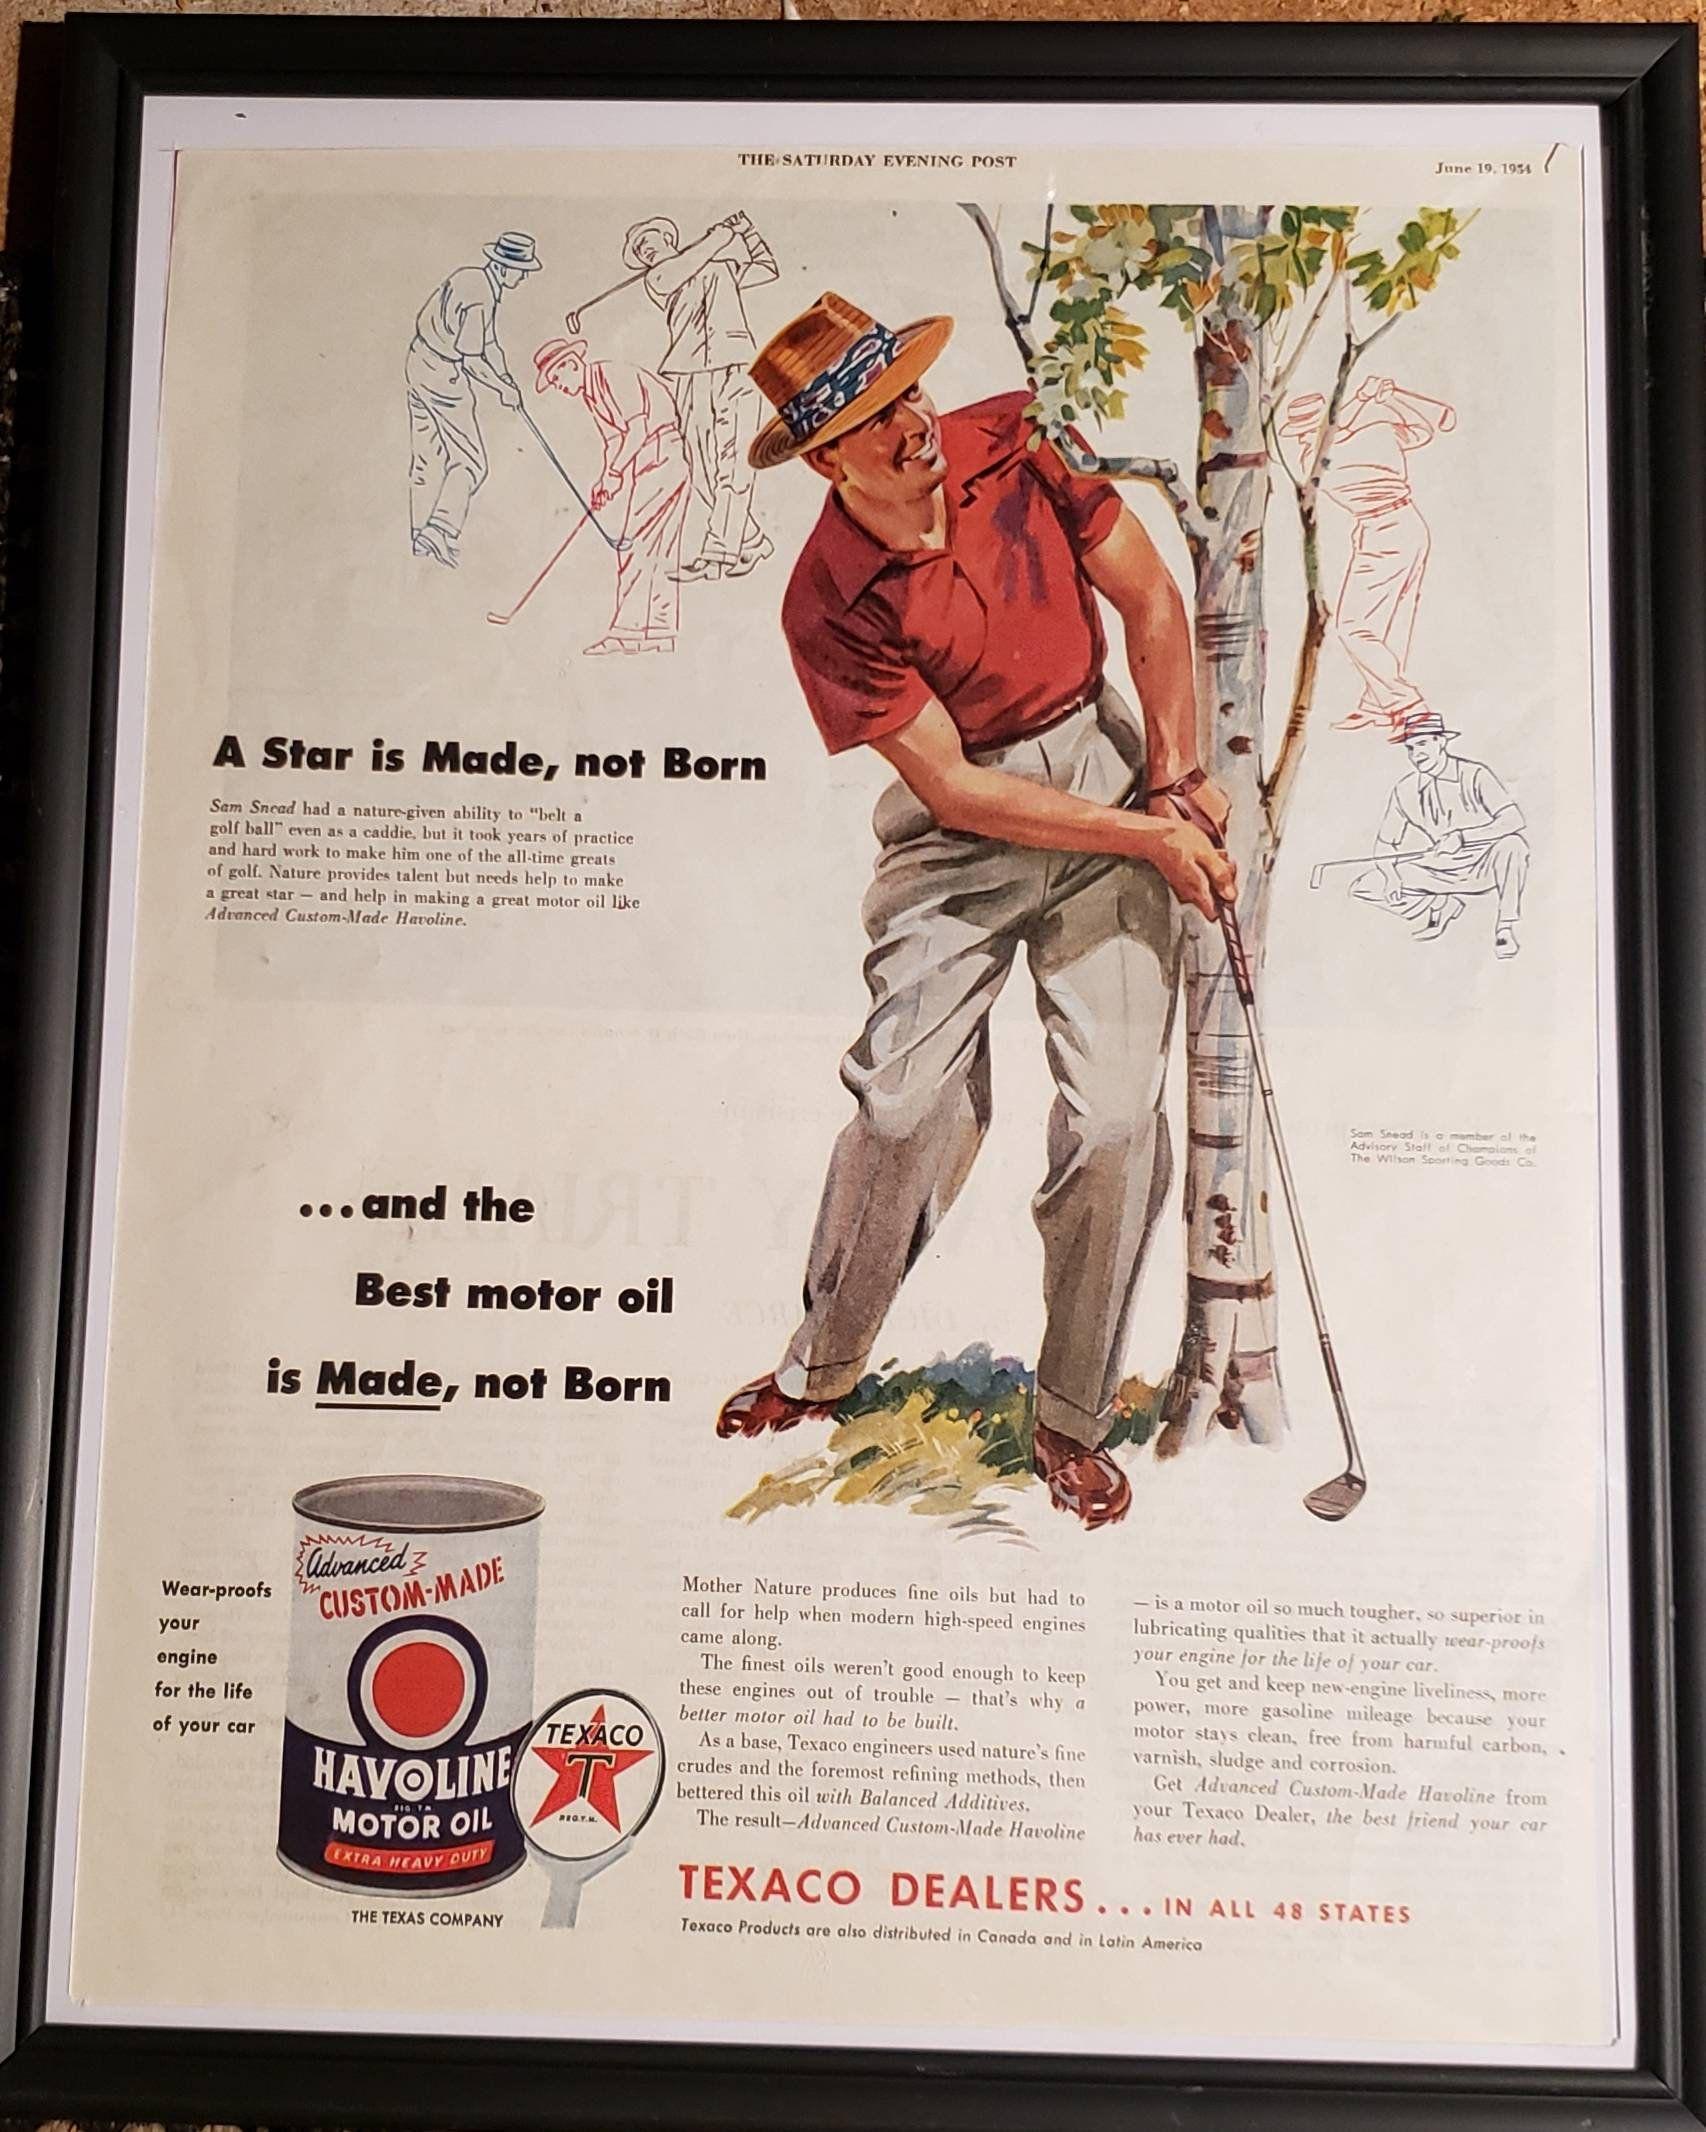 Framed original vintage 1954 Sam Snead Havoline Motor Oil Texaco